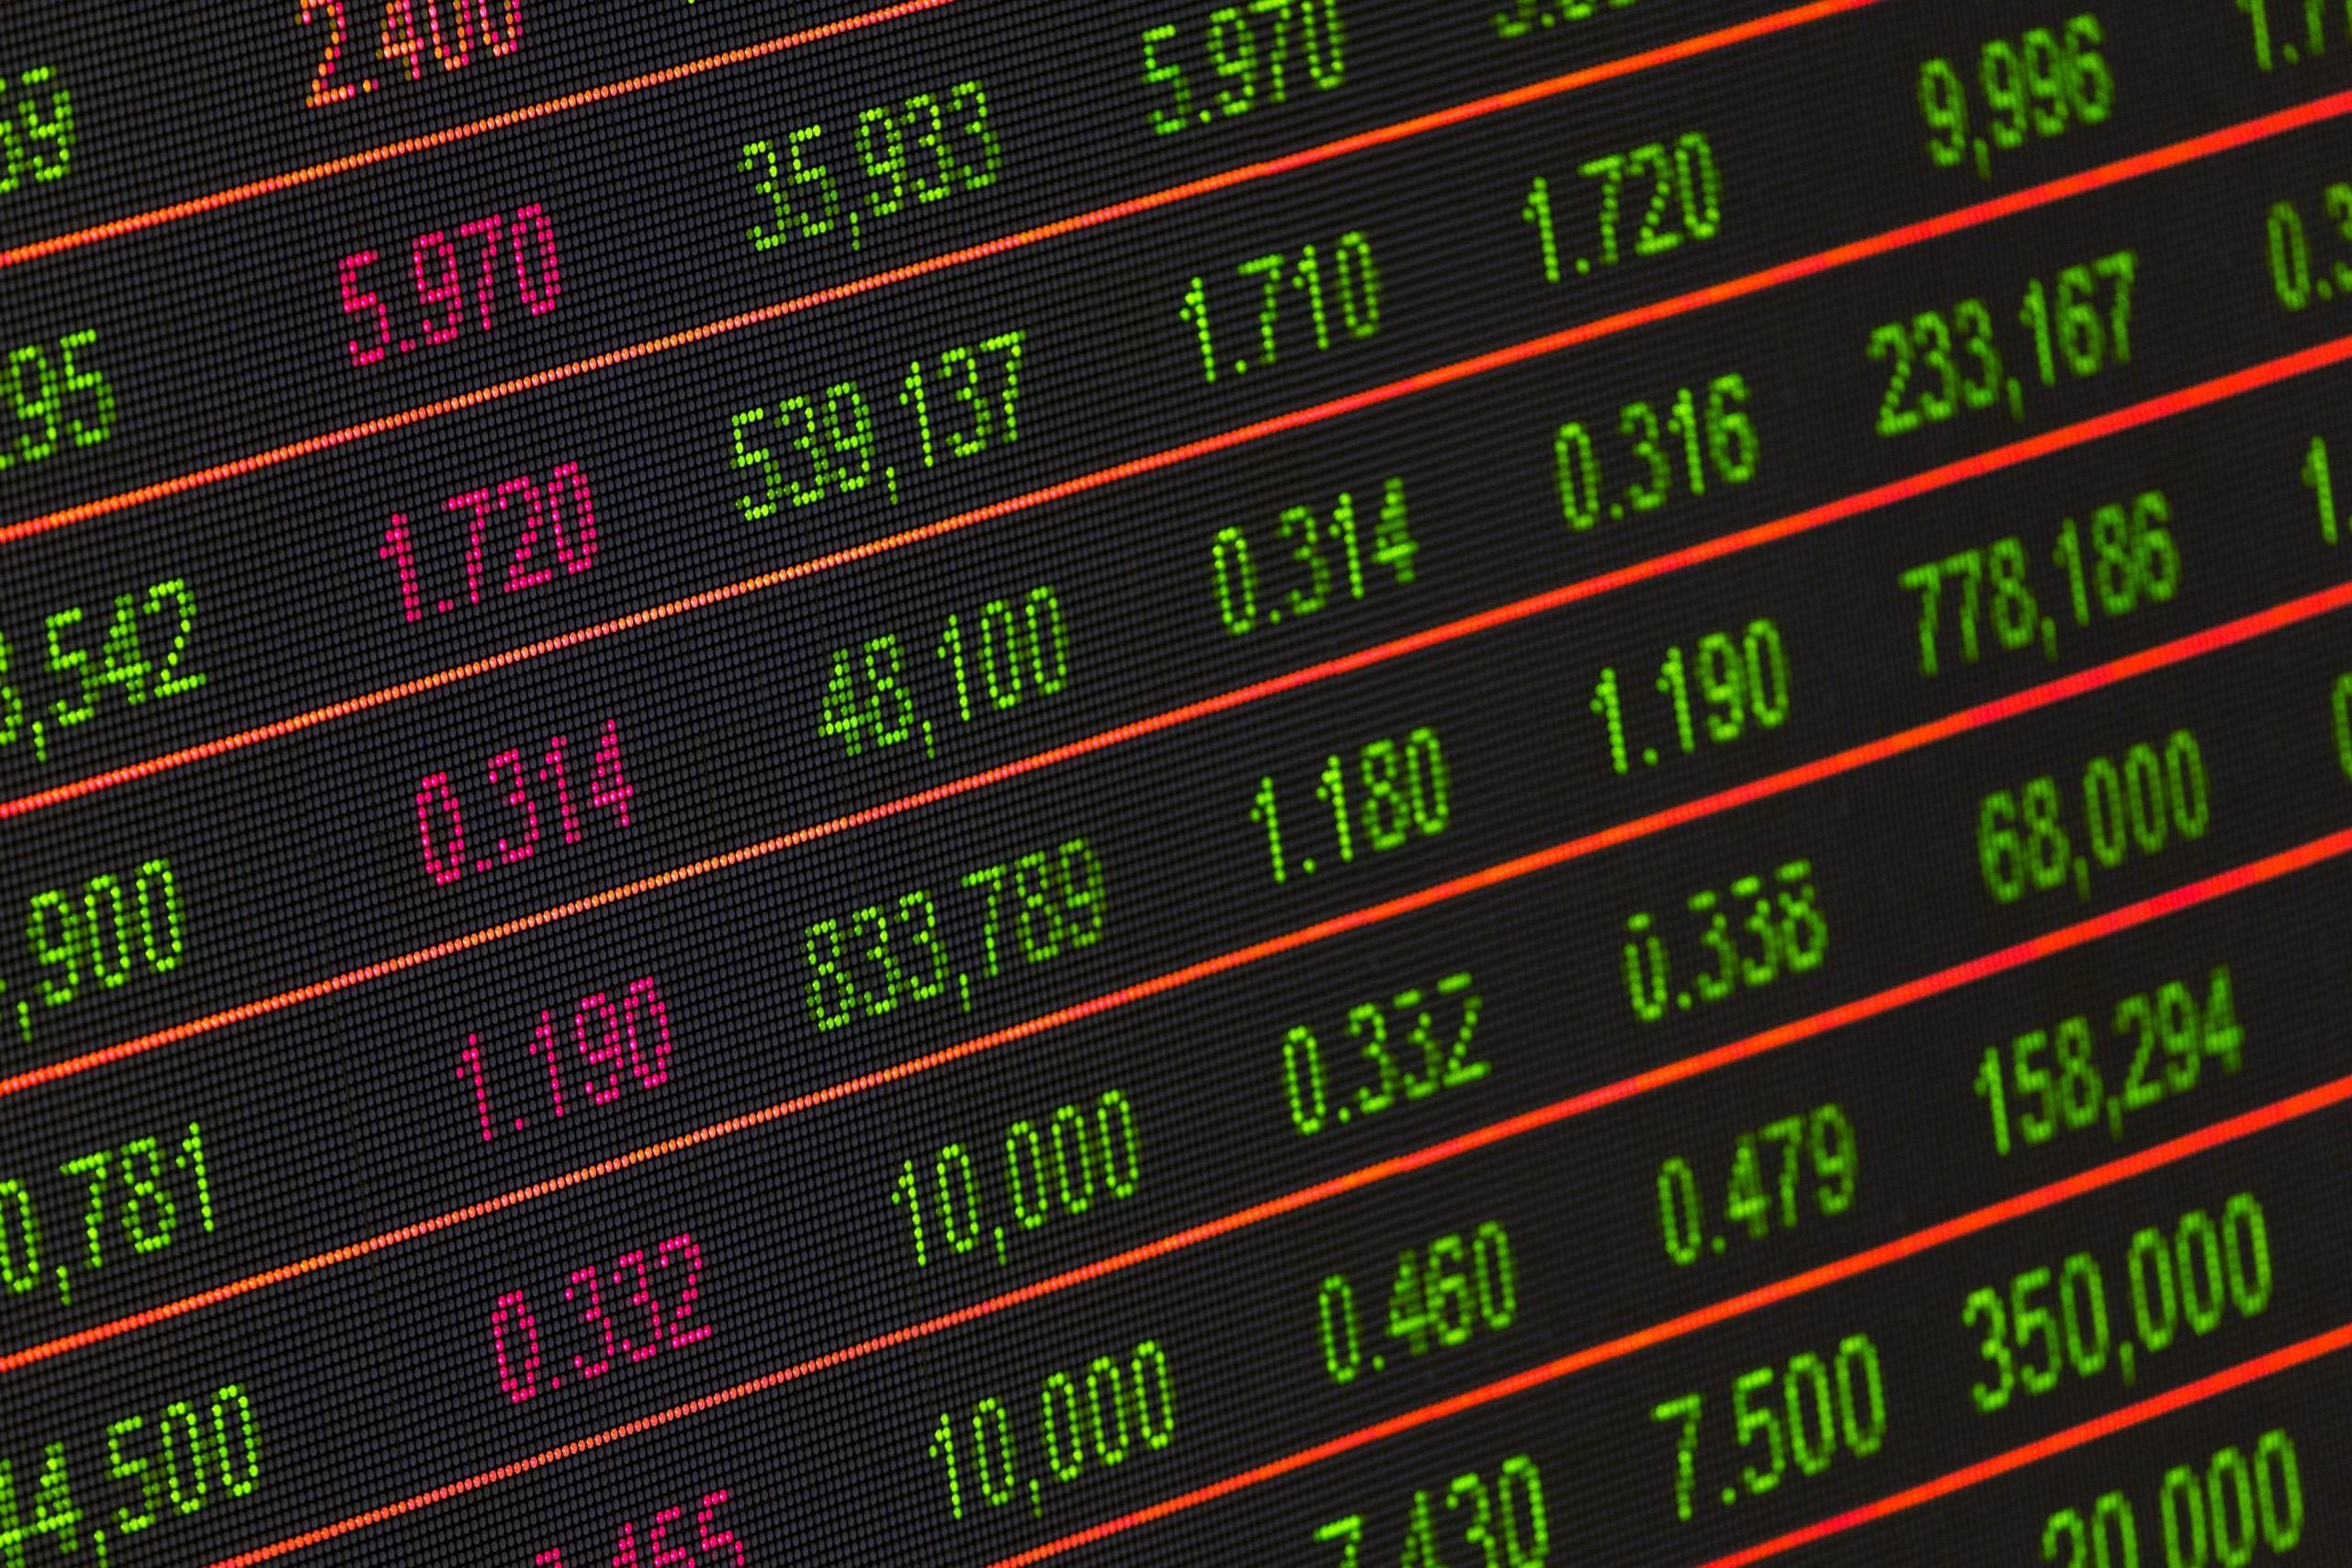 archTIS completes $2.24 million capital raising to drive Kojensi Platform growth